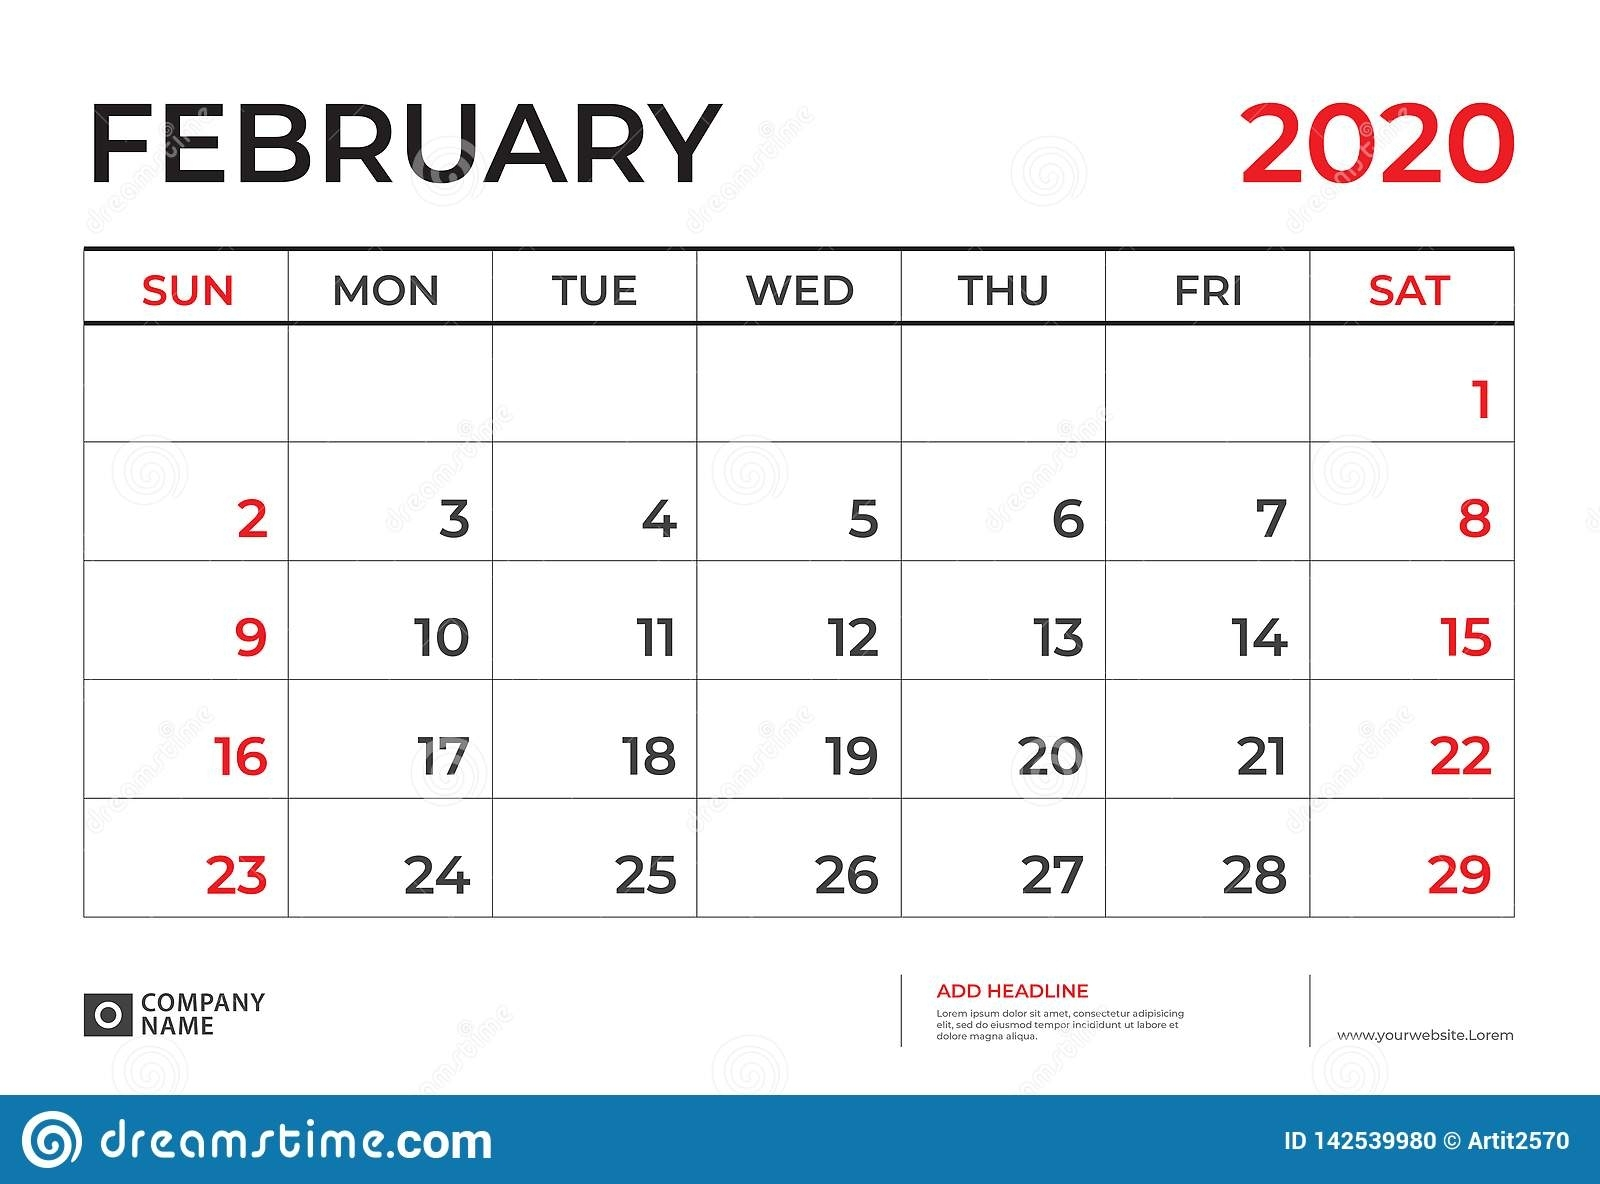 February 2020 Calendar Template, Desk Calendar Layout Size